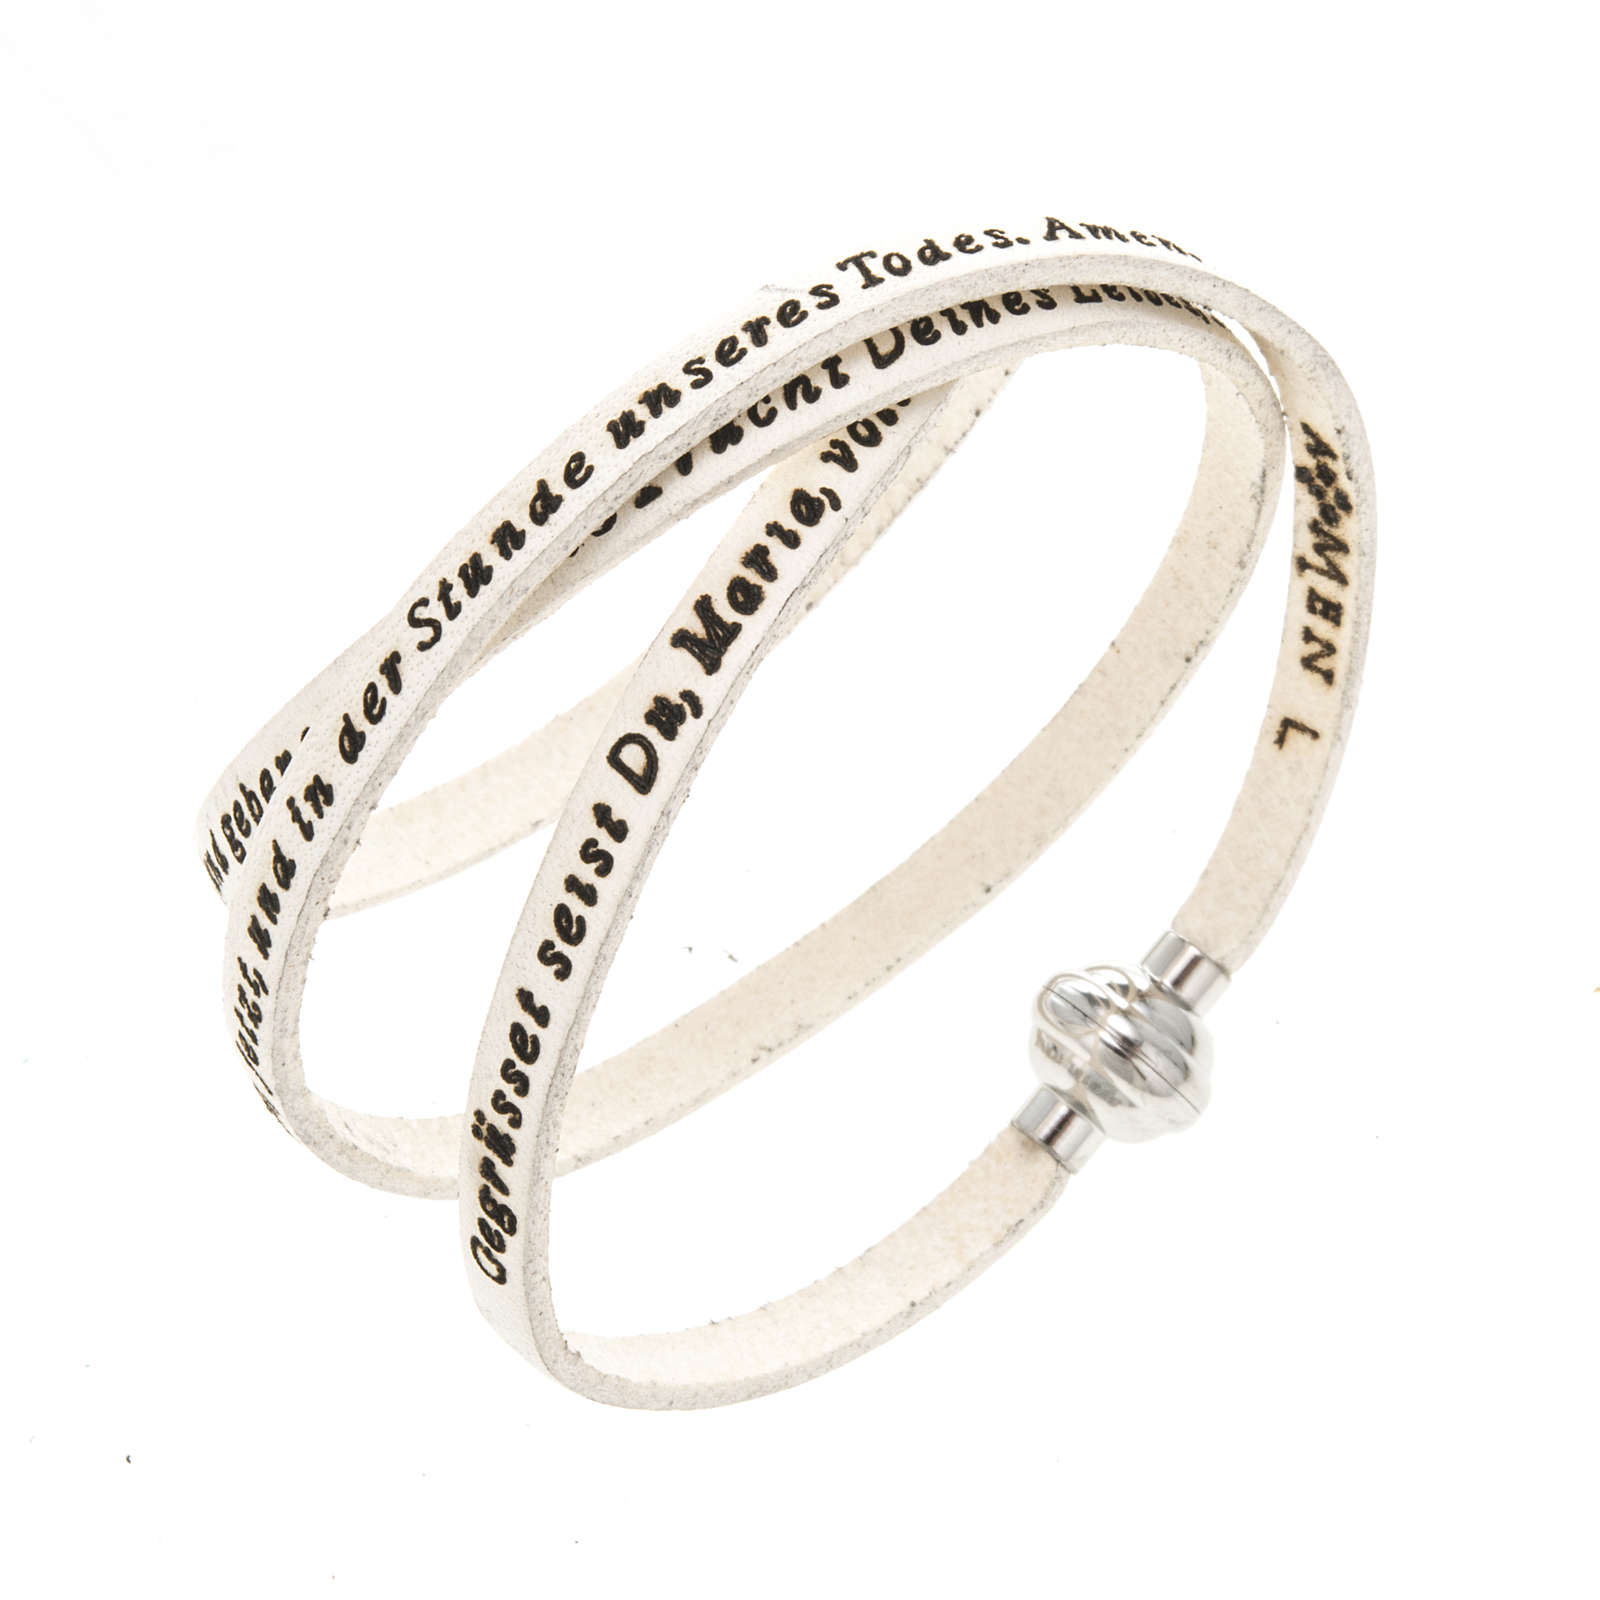 Amen Bracelet in white leather Hail Mary GER 4